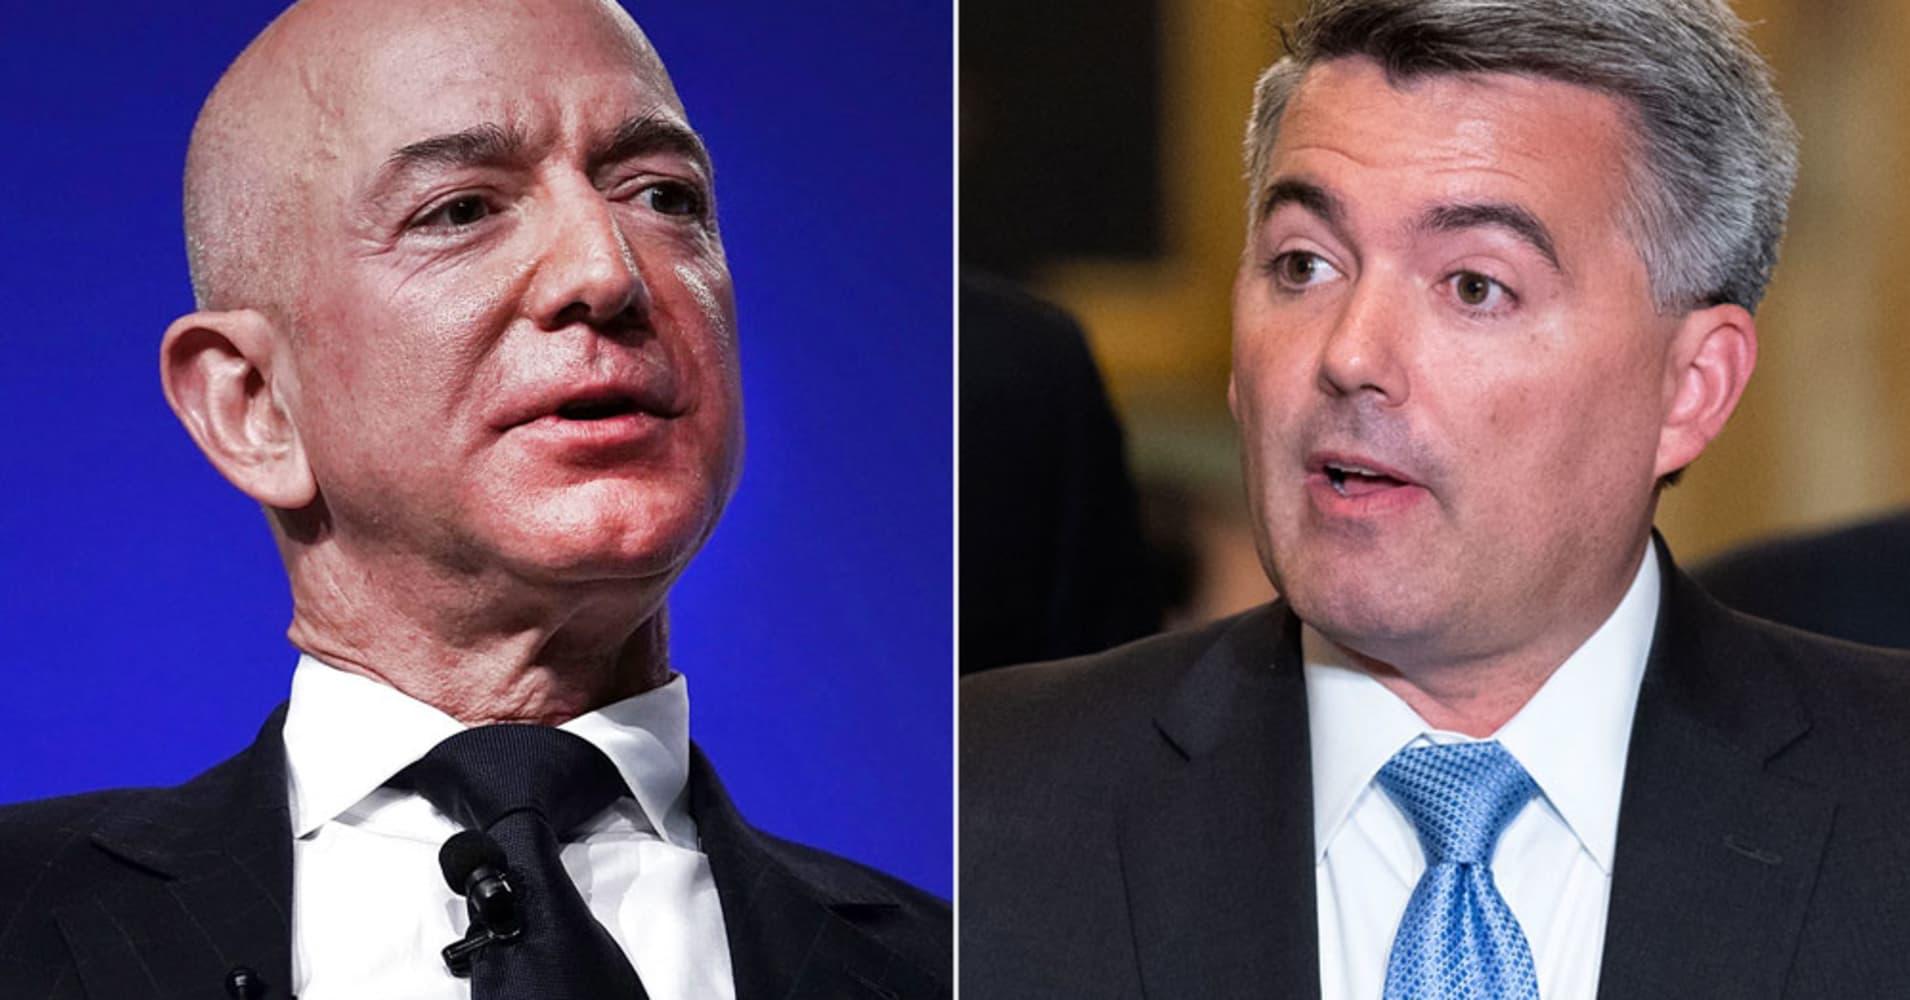 Jeff Bezos, Amazon Execs Pump Cash into GOP Sen. Cory Gardner's Re-election Campaign